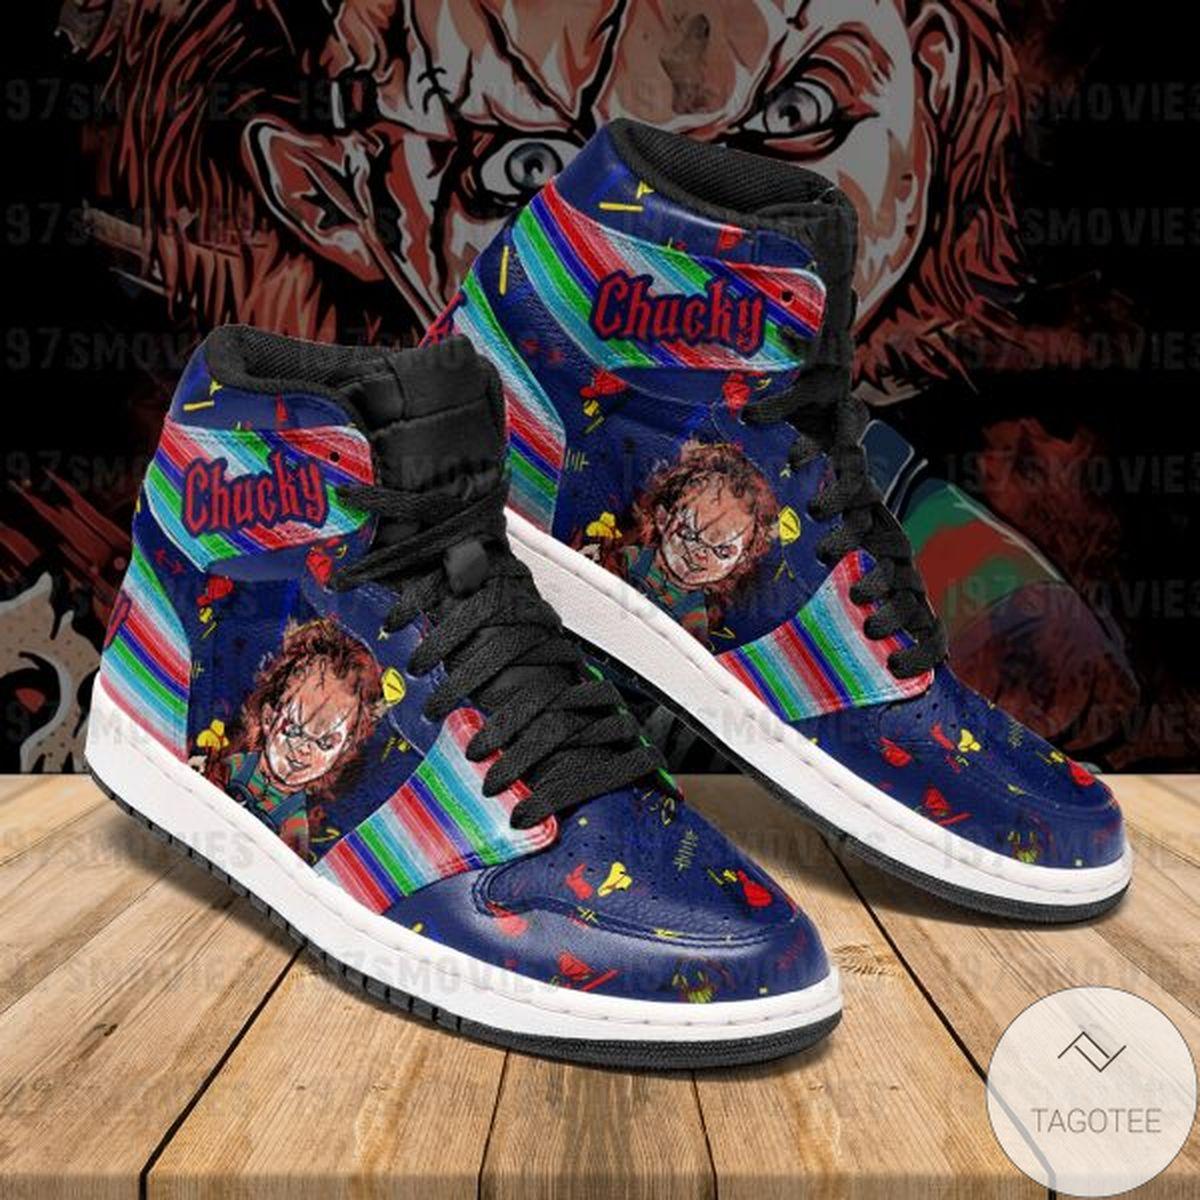 Chucky Child's Play Sneaker Air Jordan High Top Shoes